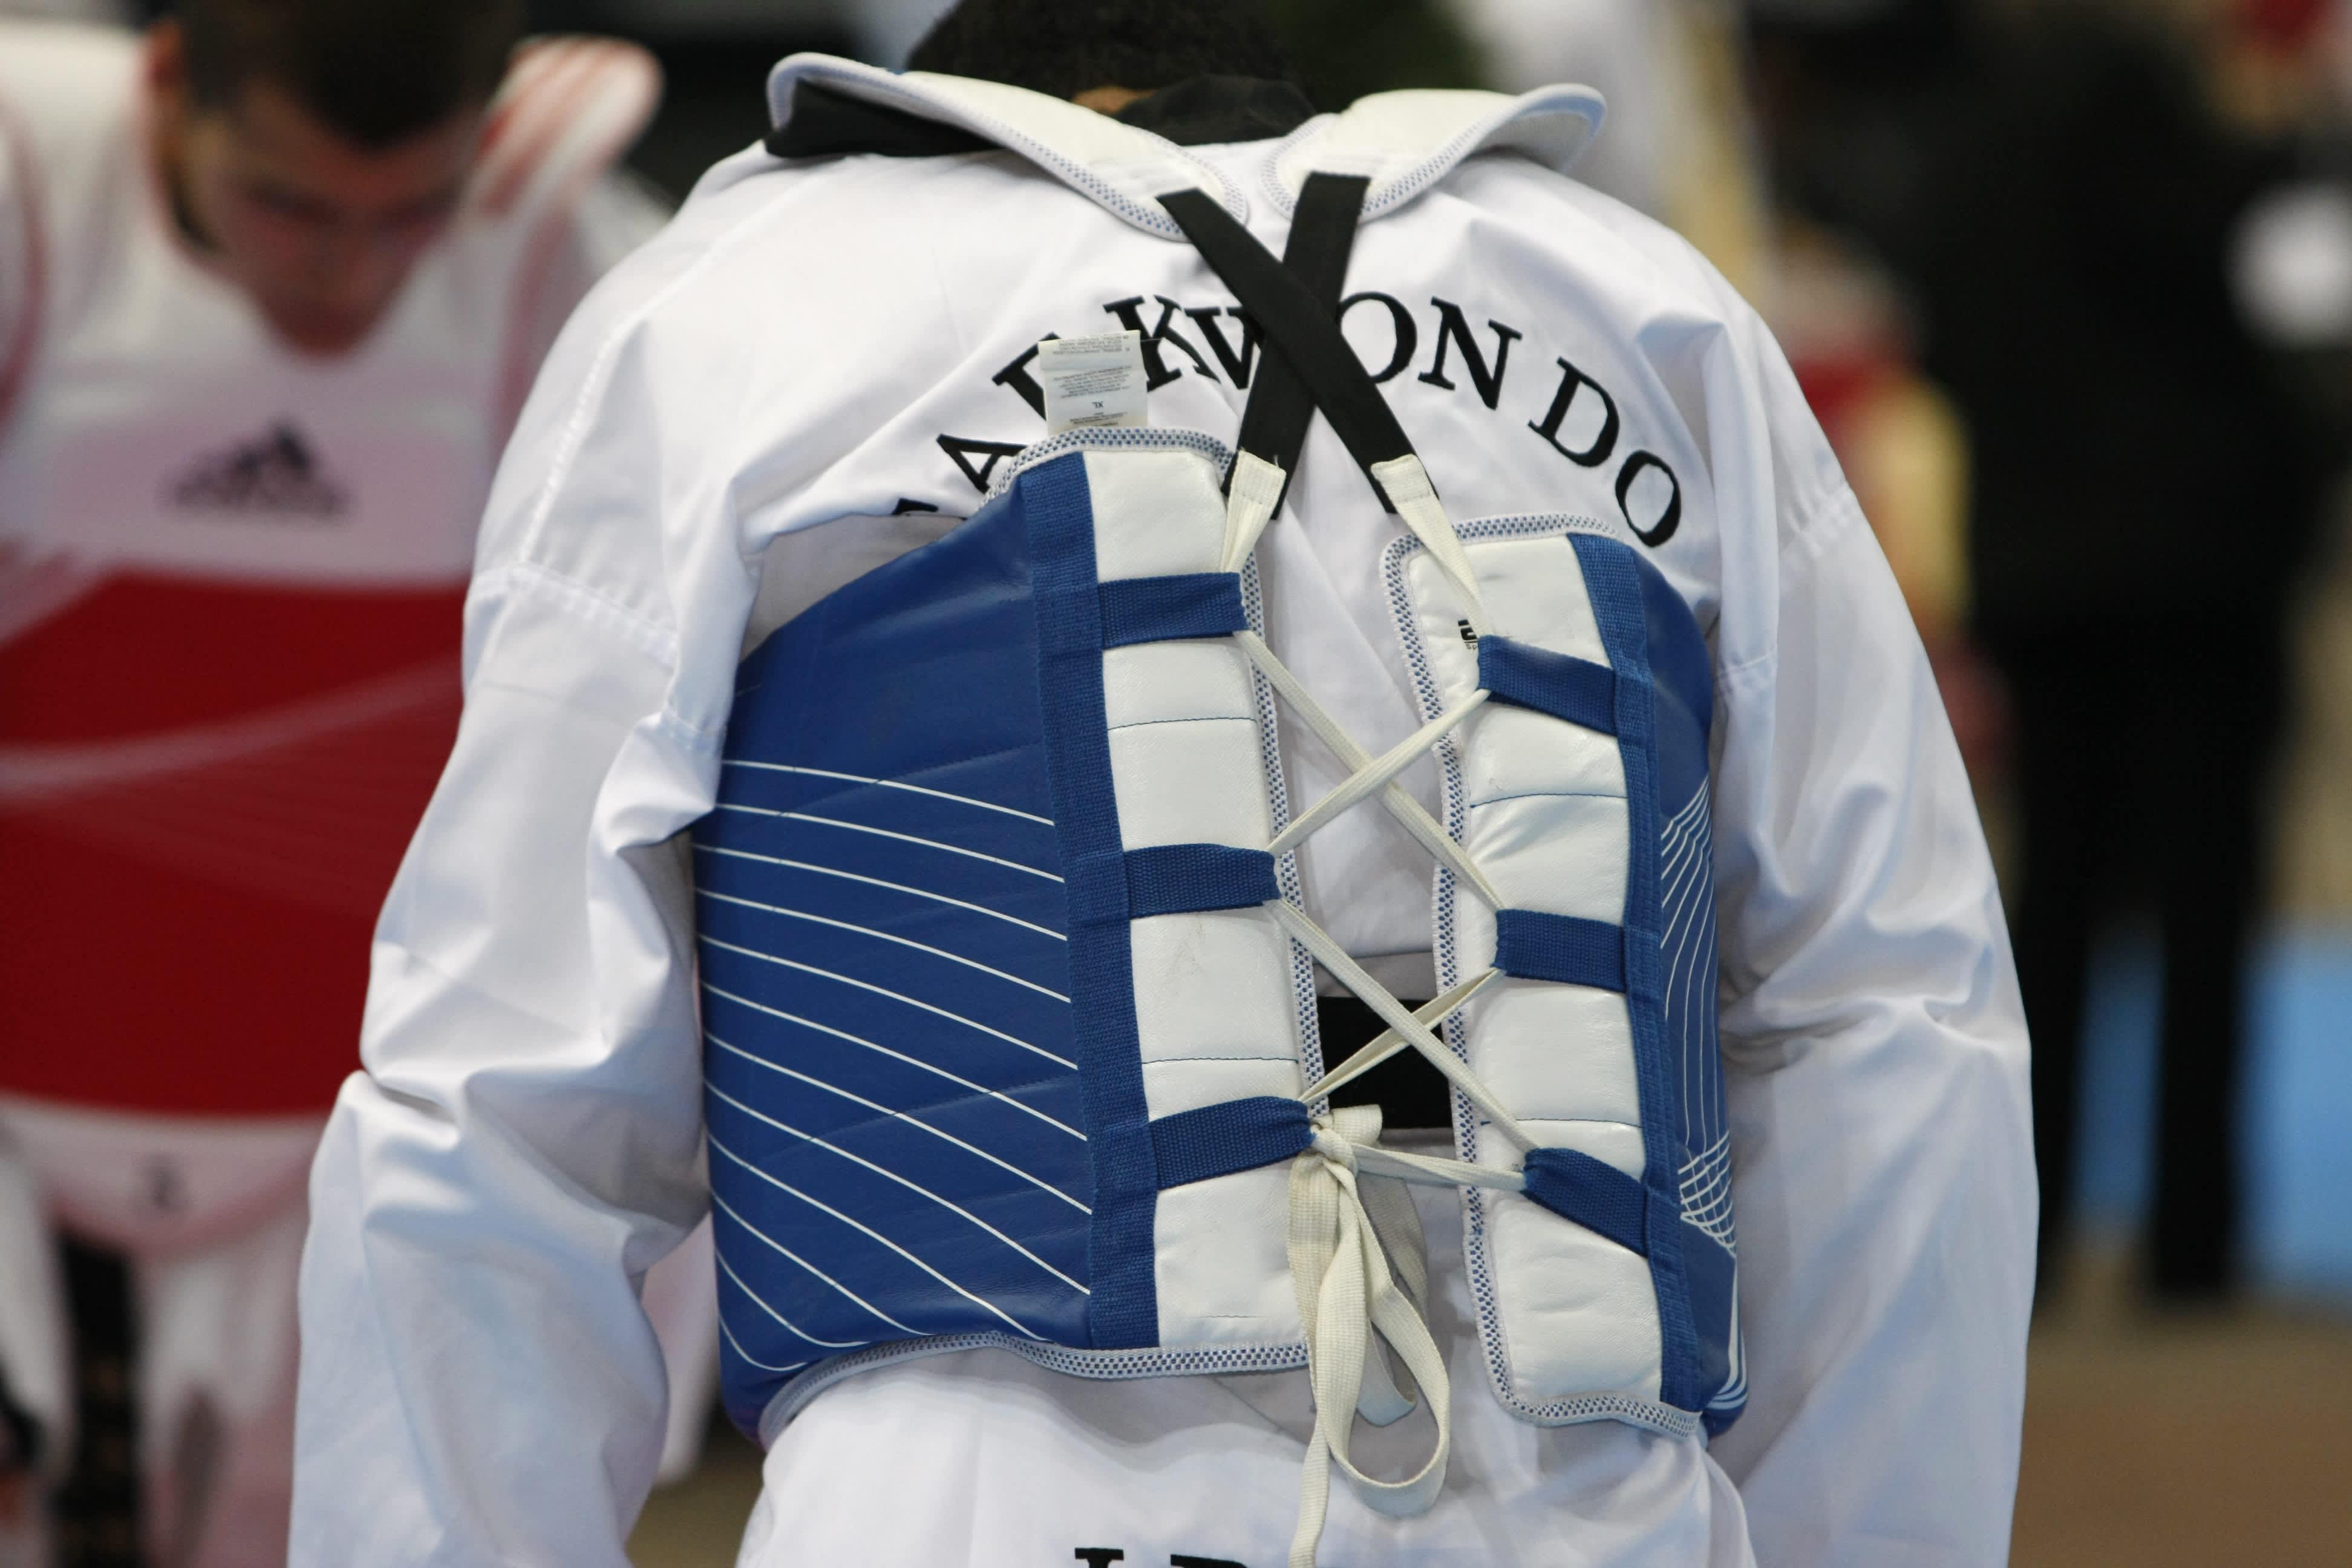 Taekwondo - Beginner